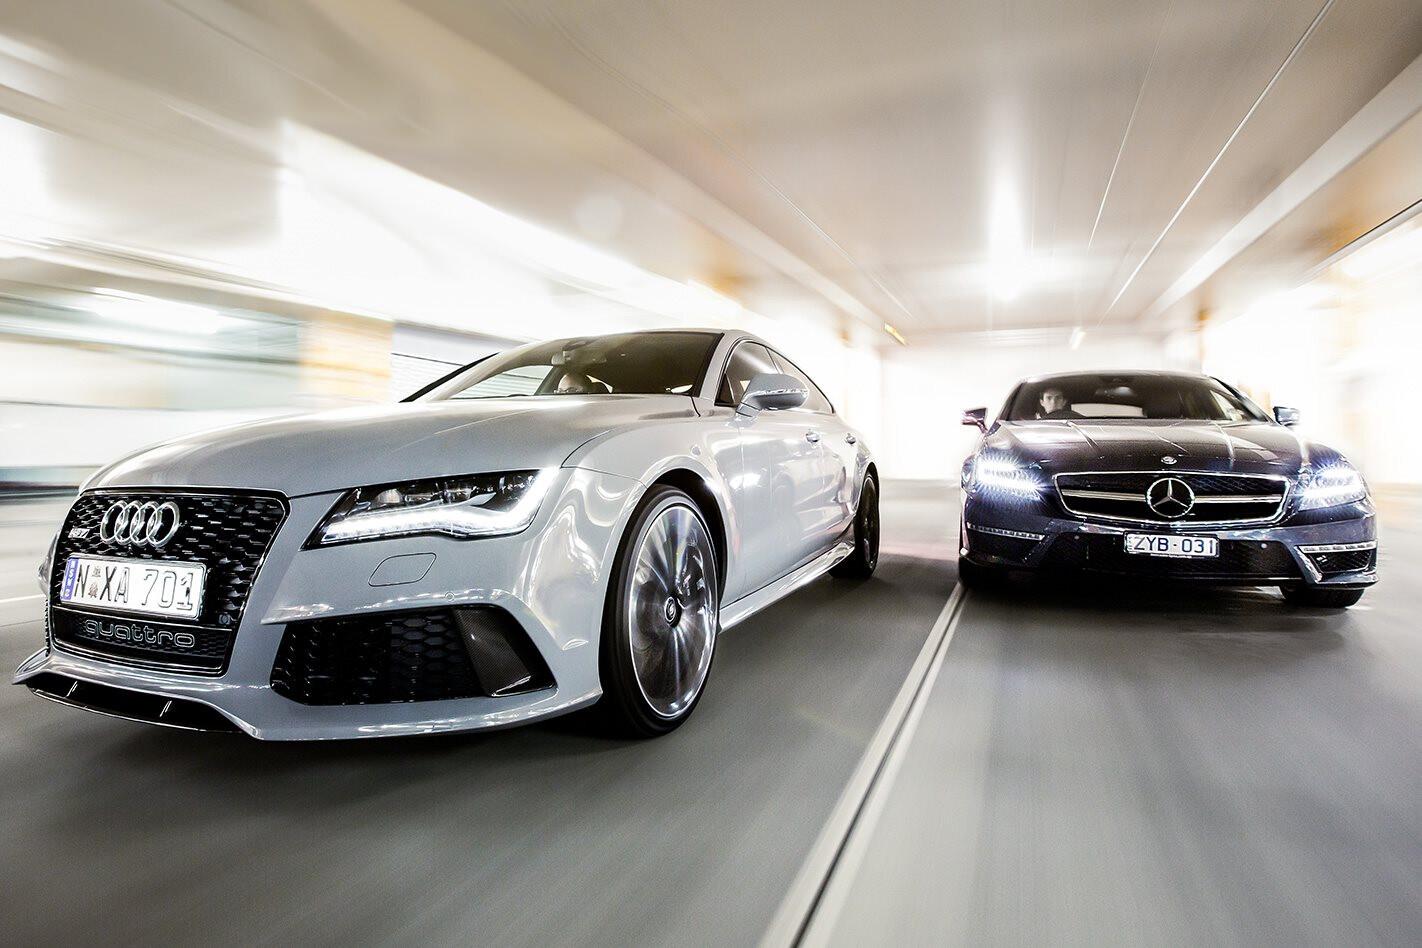 Audi RS7 v Mercedes-Benz CLS63 S